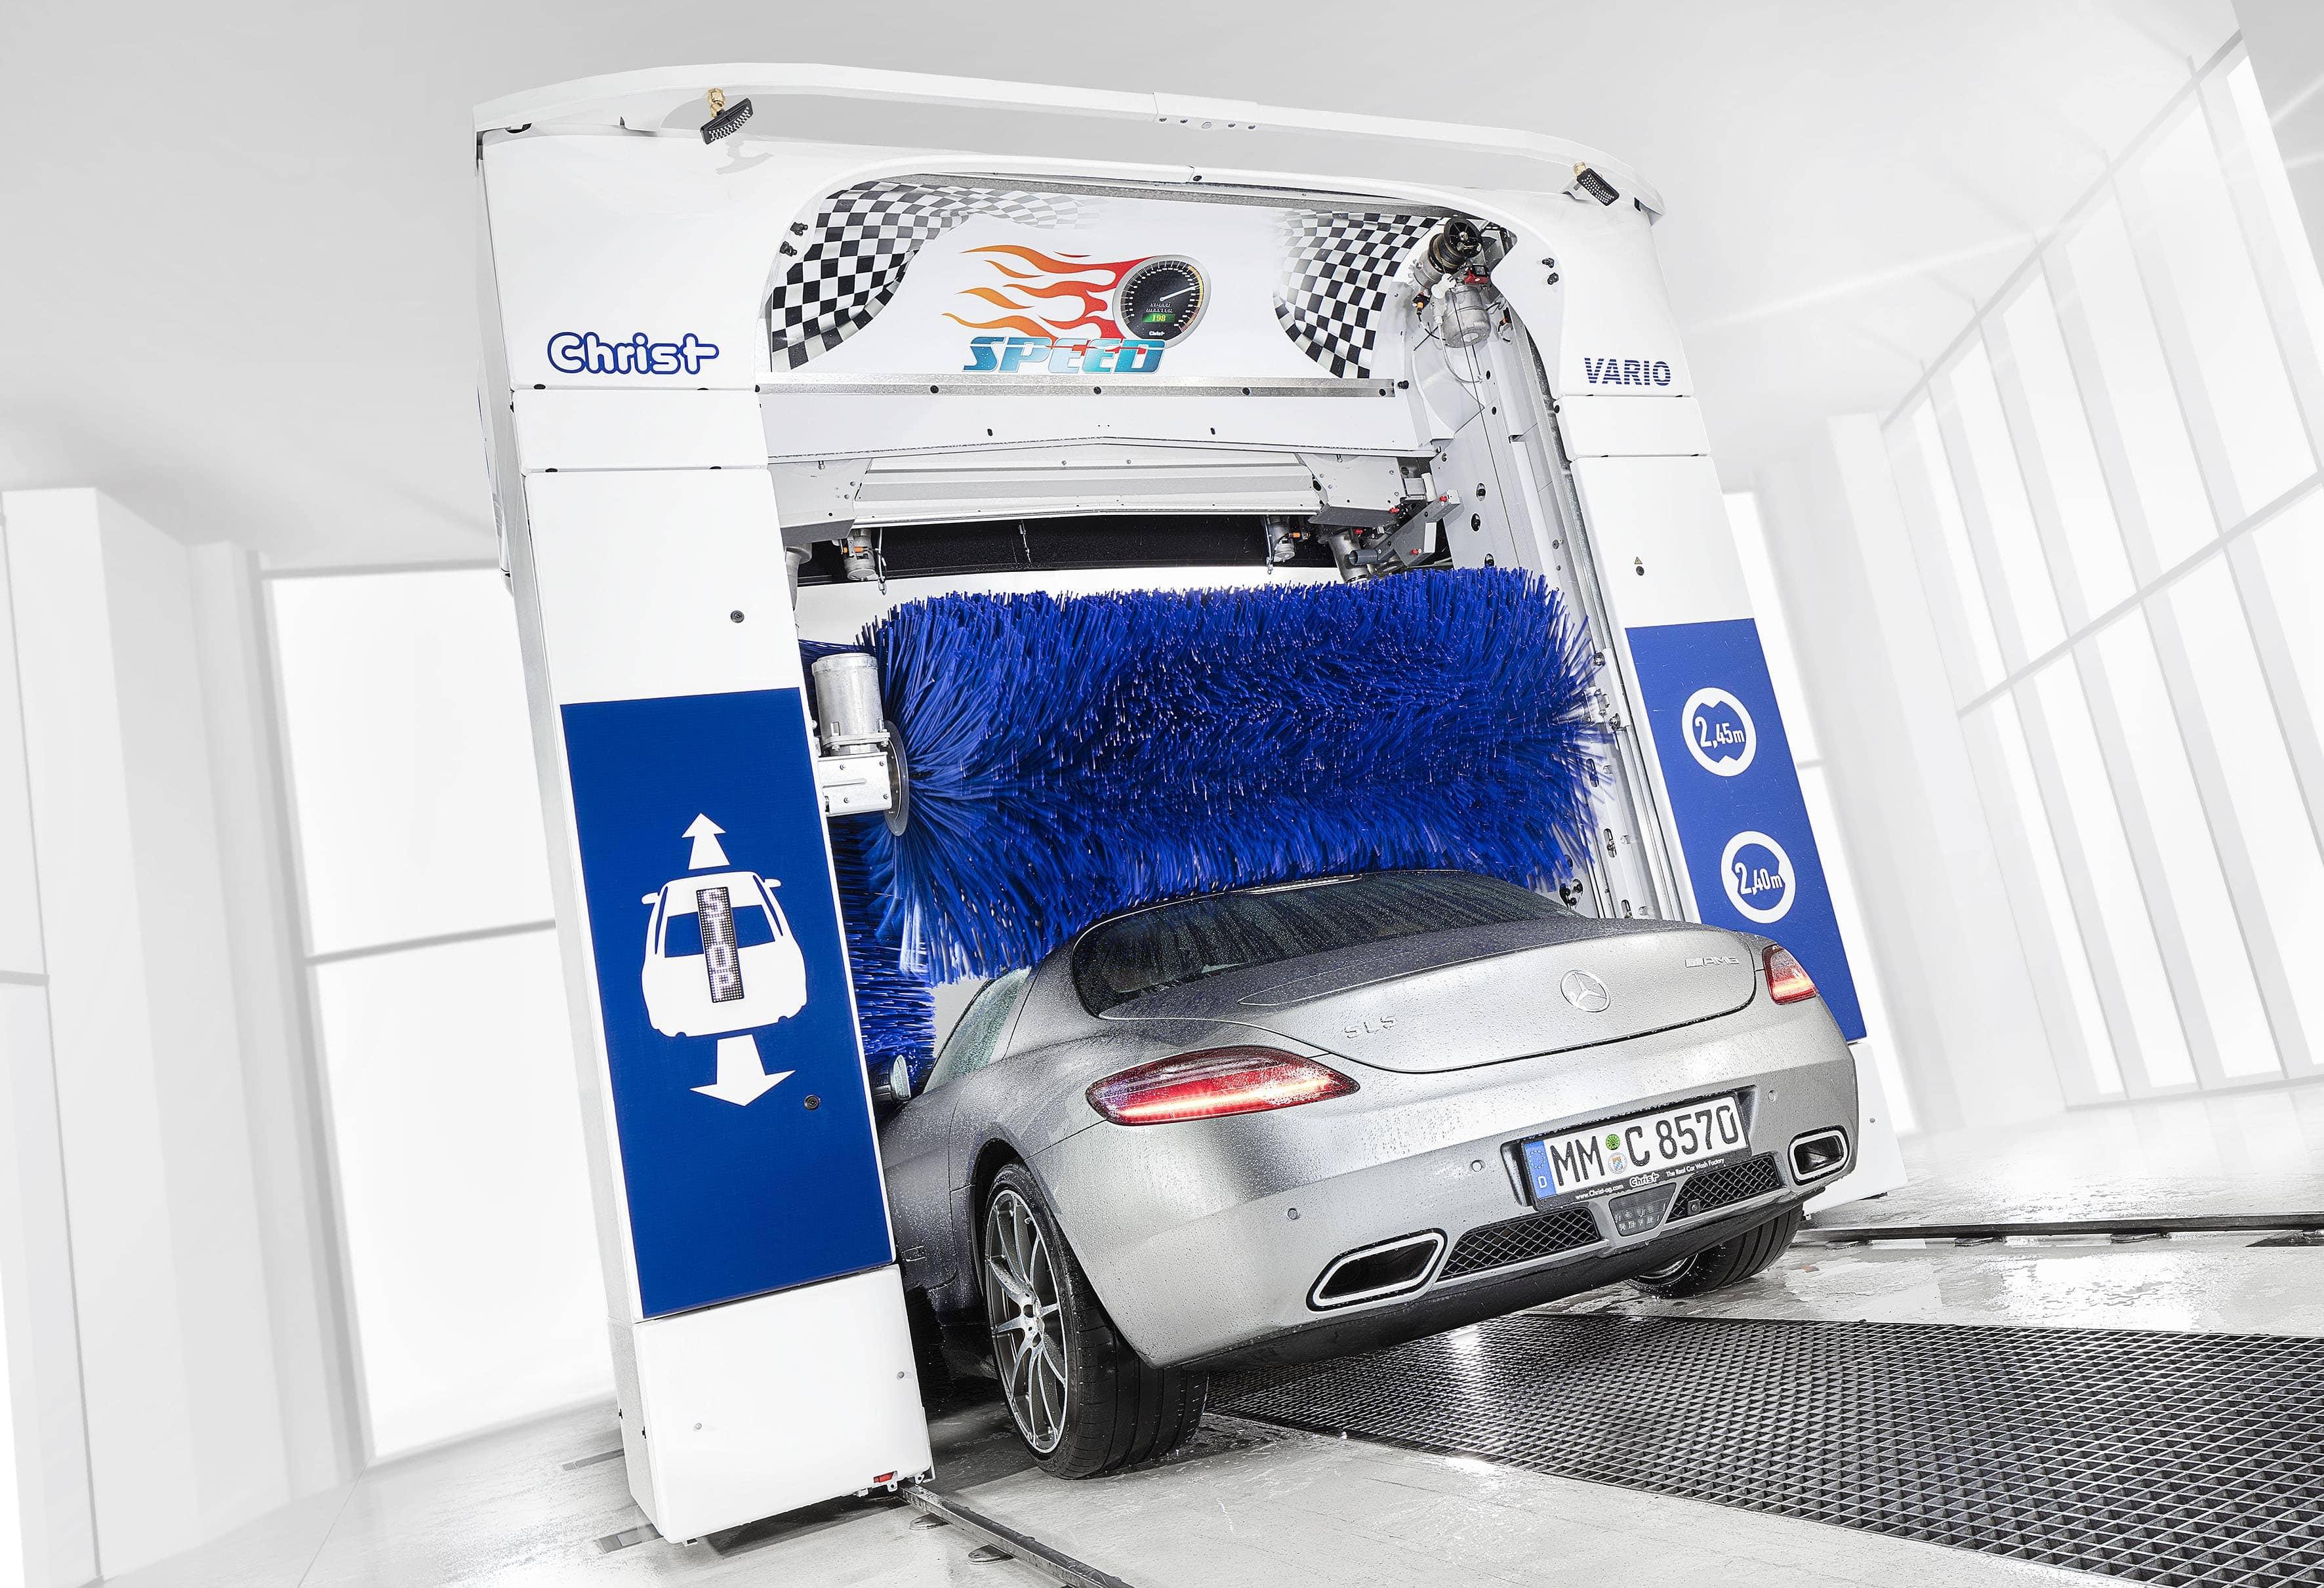 UNITI Expo - Car wash show las vegas 2018